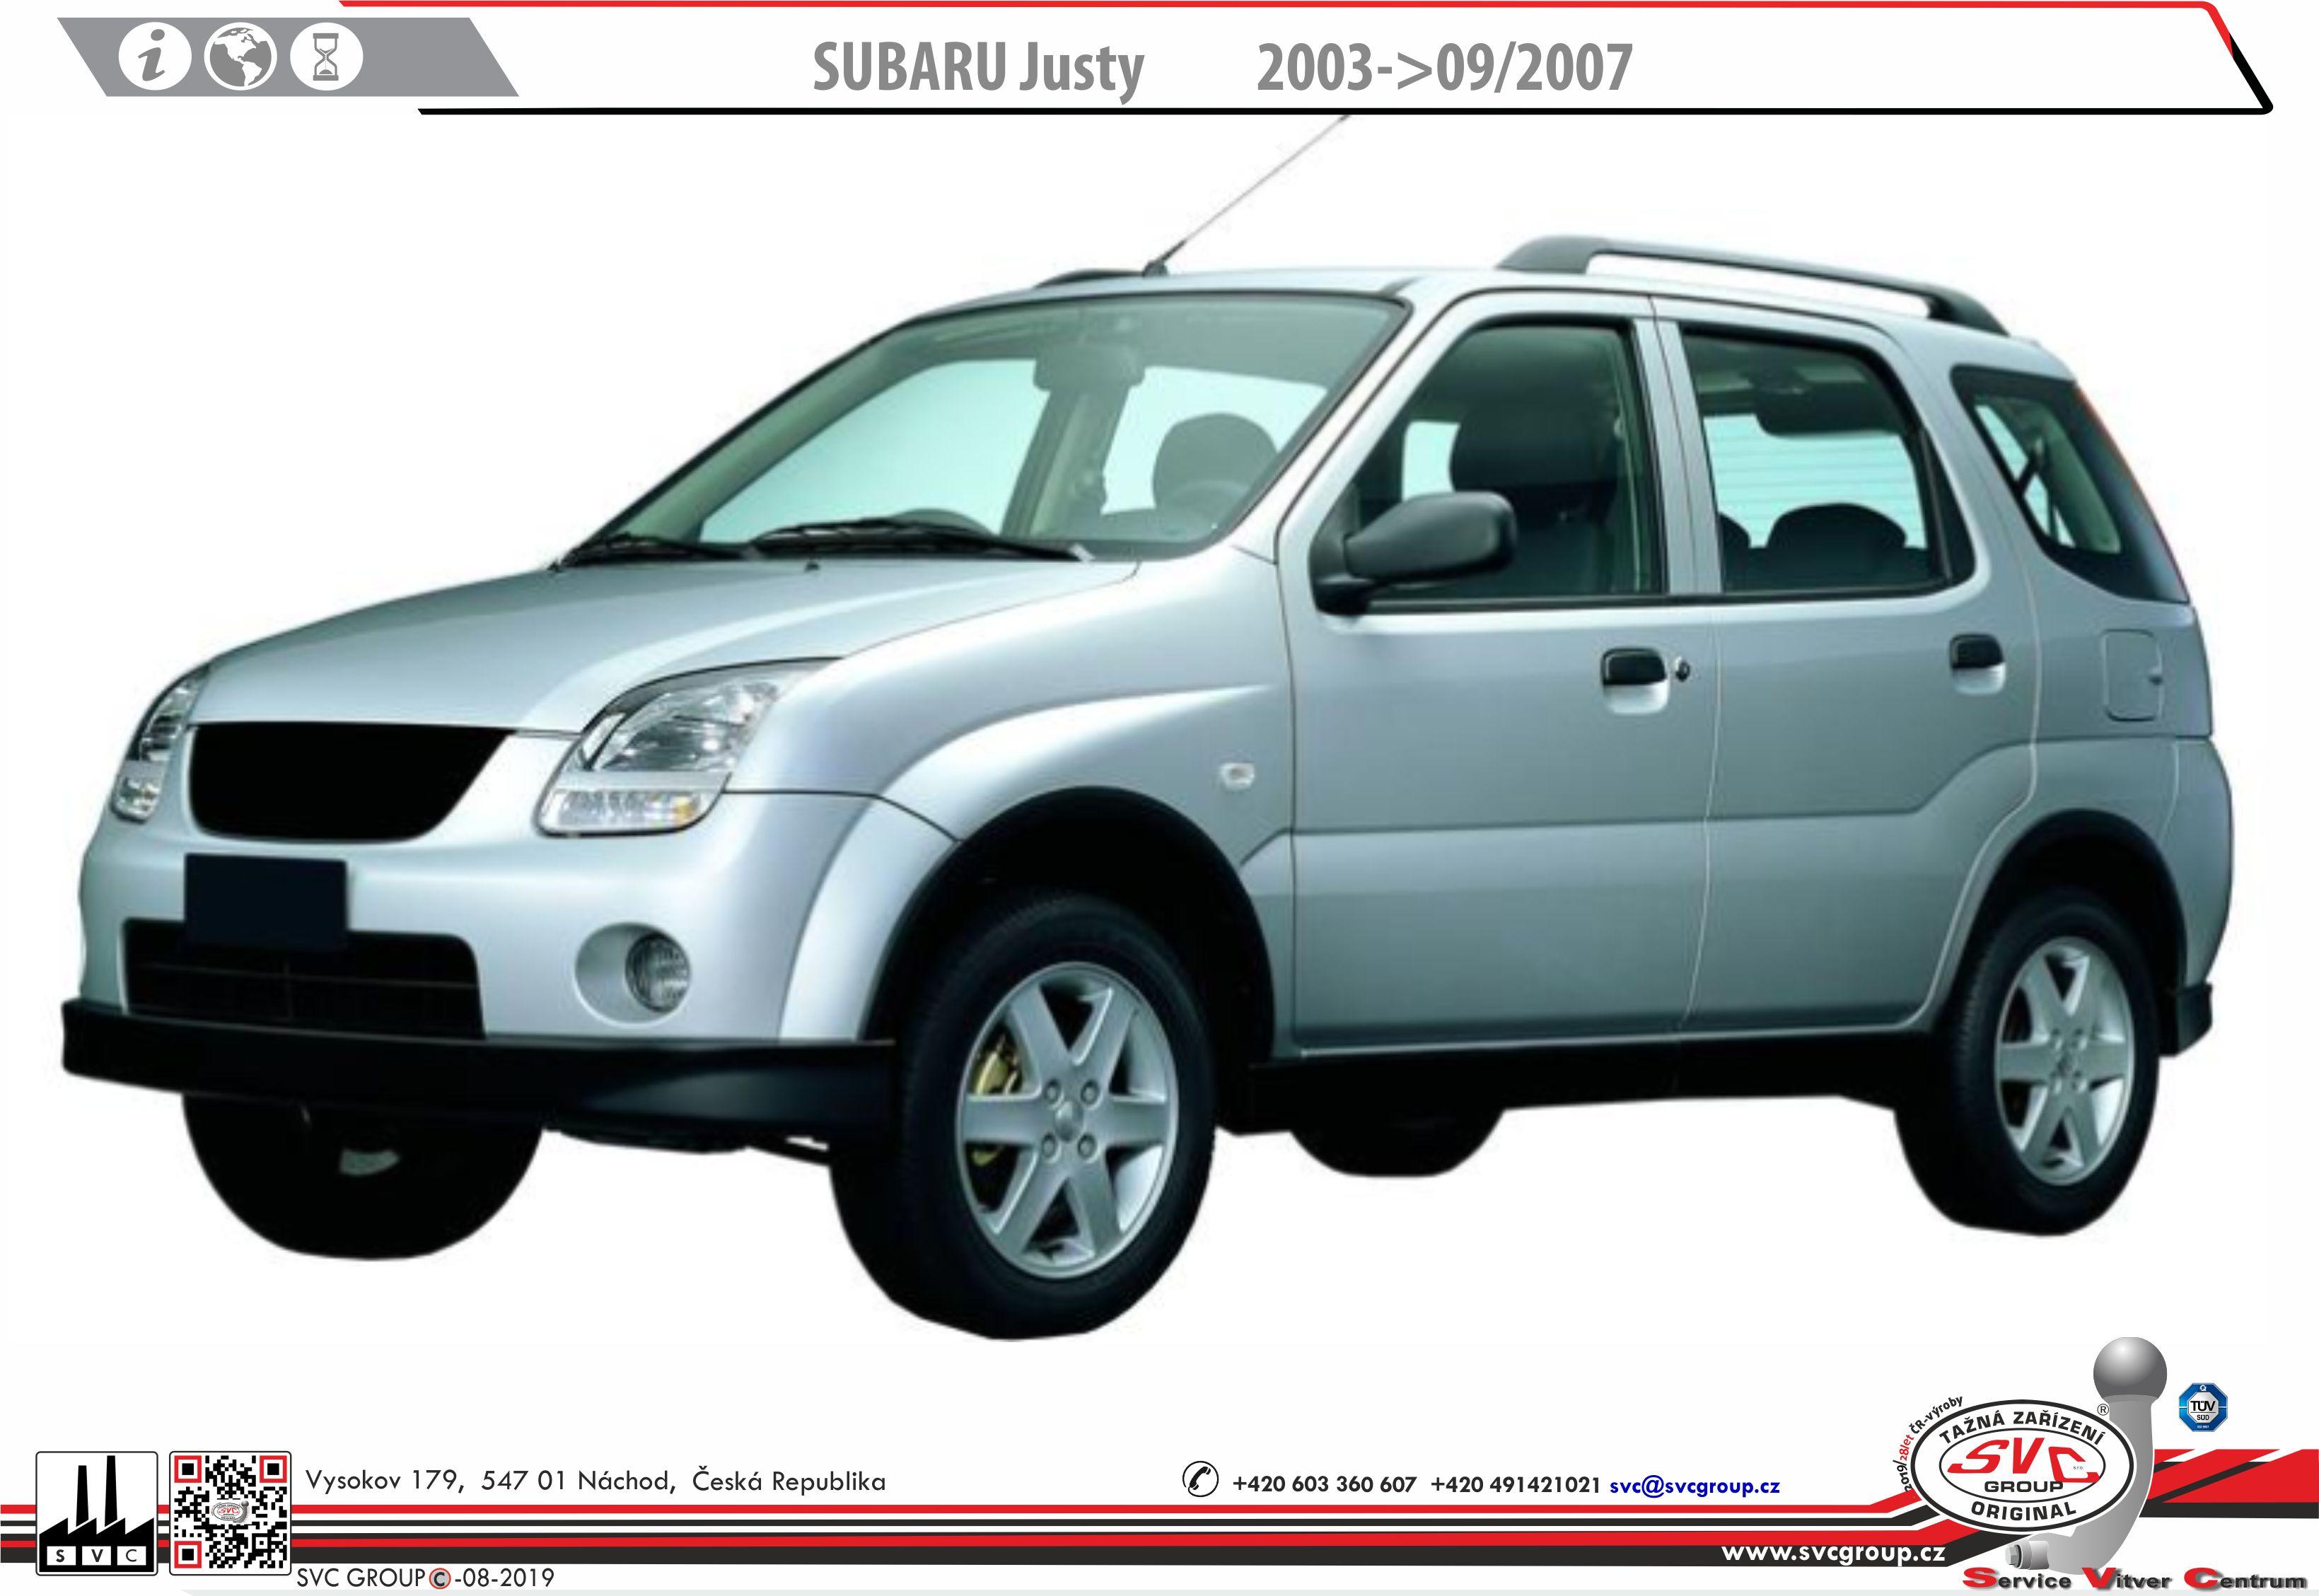 Subaru Justy Hatchback